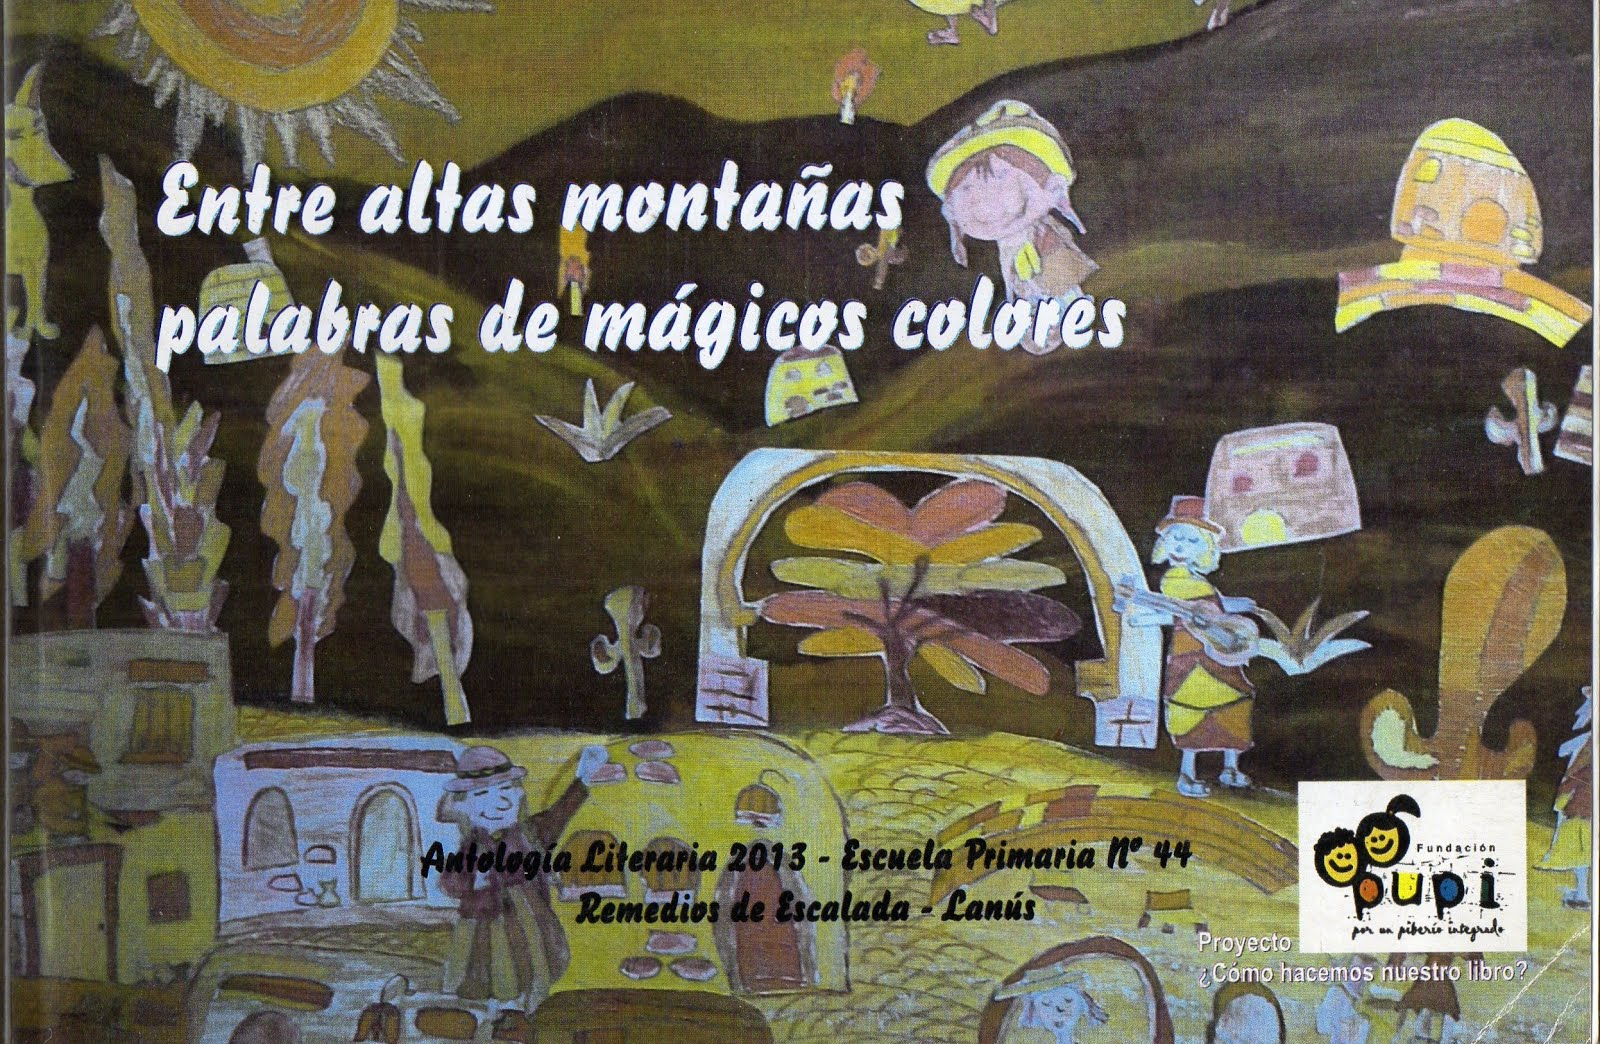 Entre altas montañas, palabras de mágicos colores